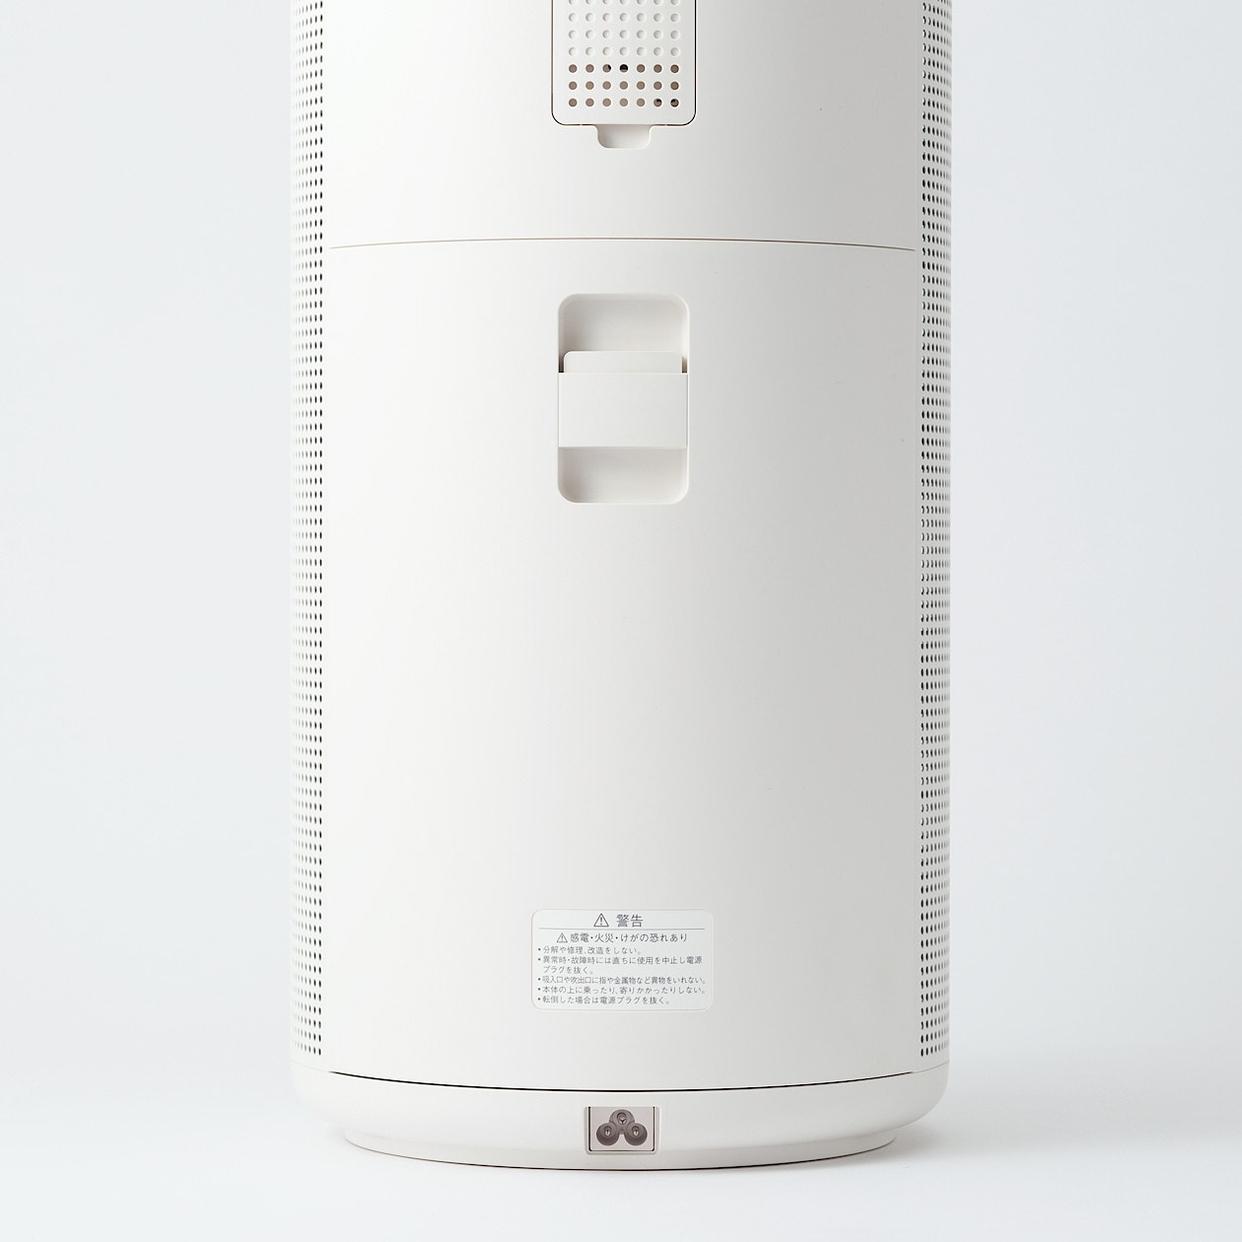 無印良品(MUJI) 空気清浄機 MJ-AP1の商品画像10